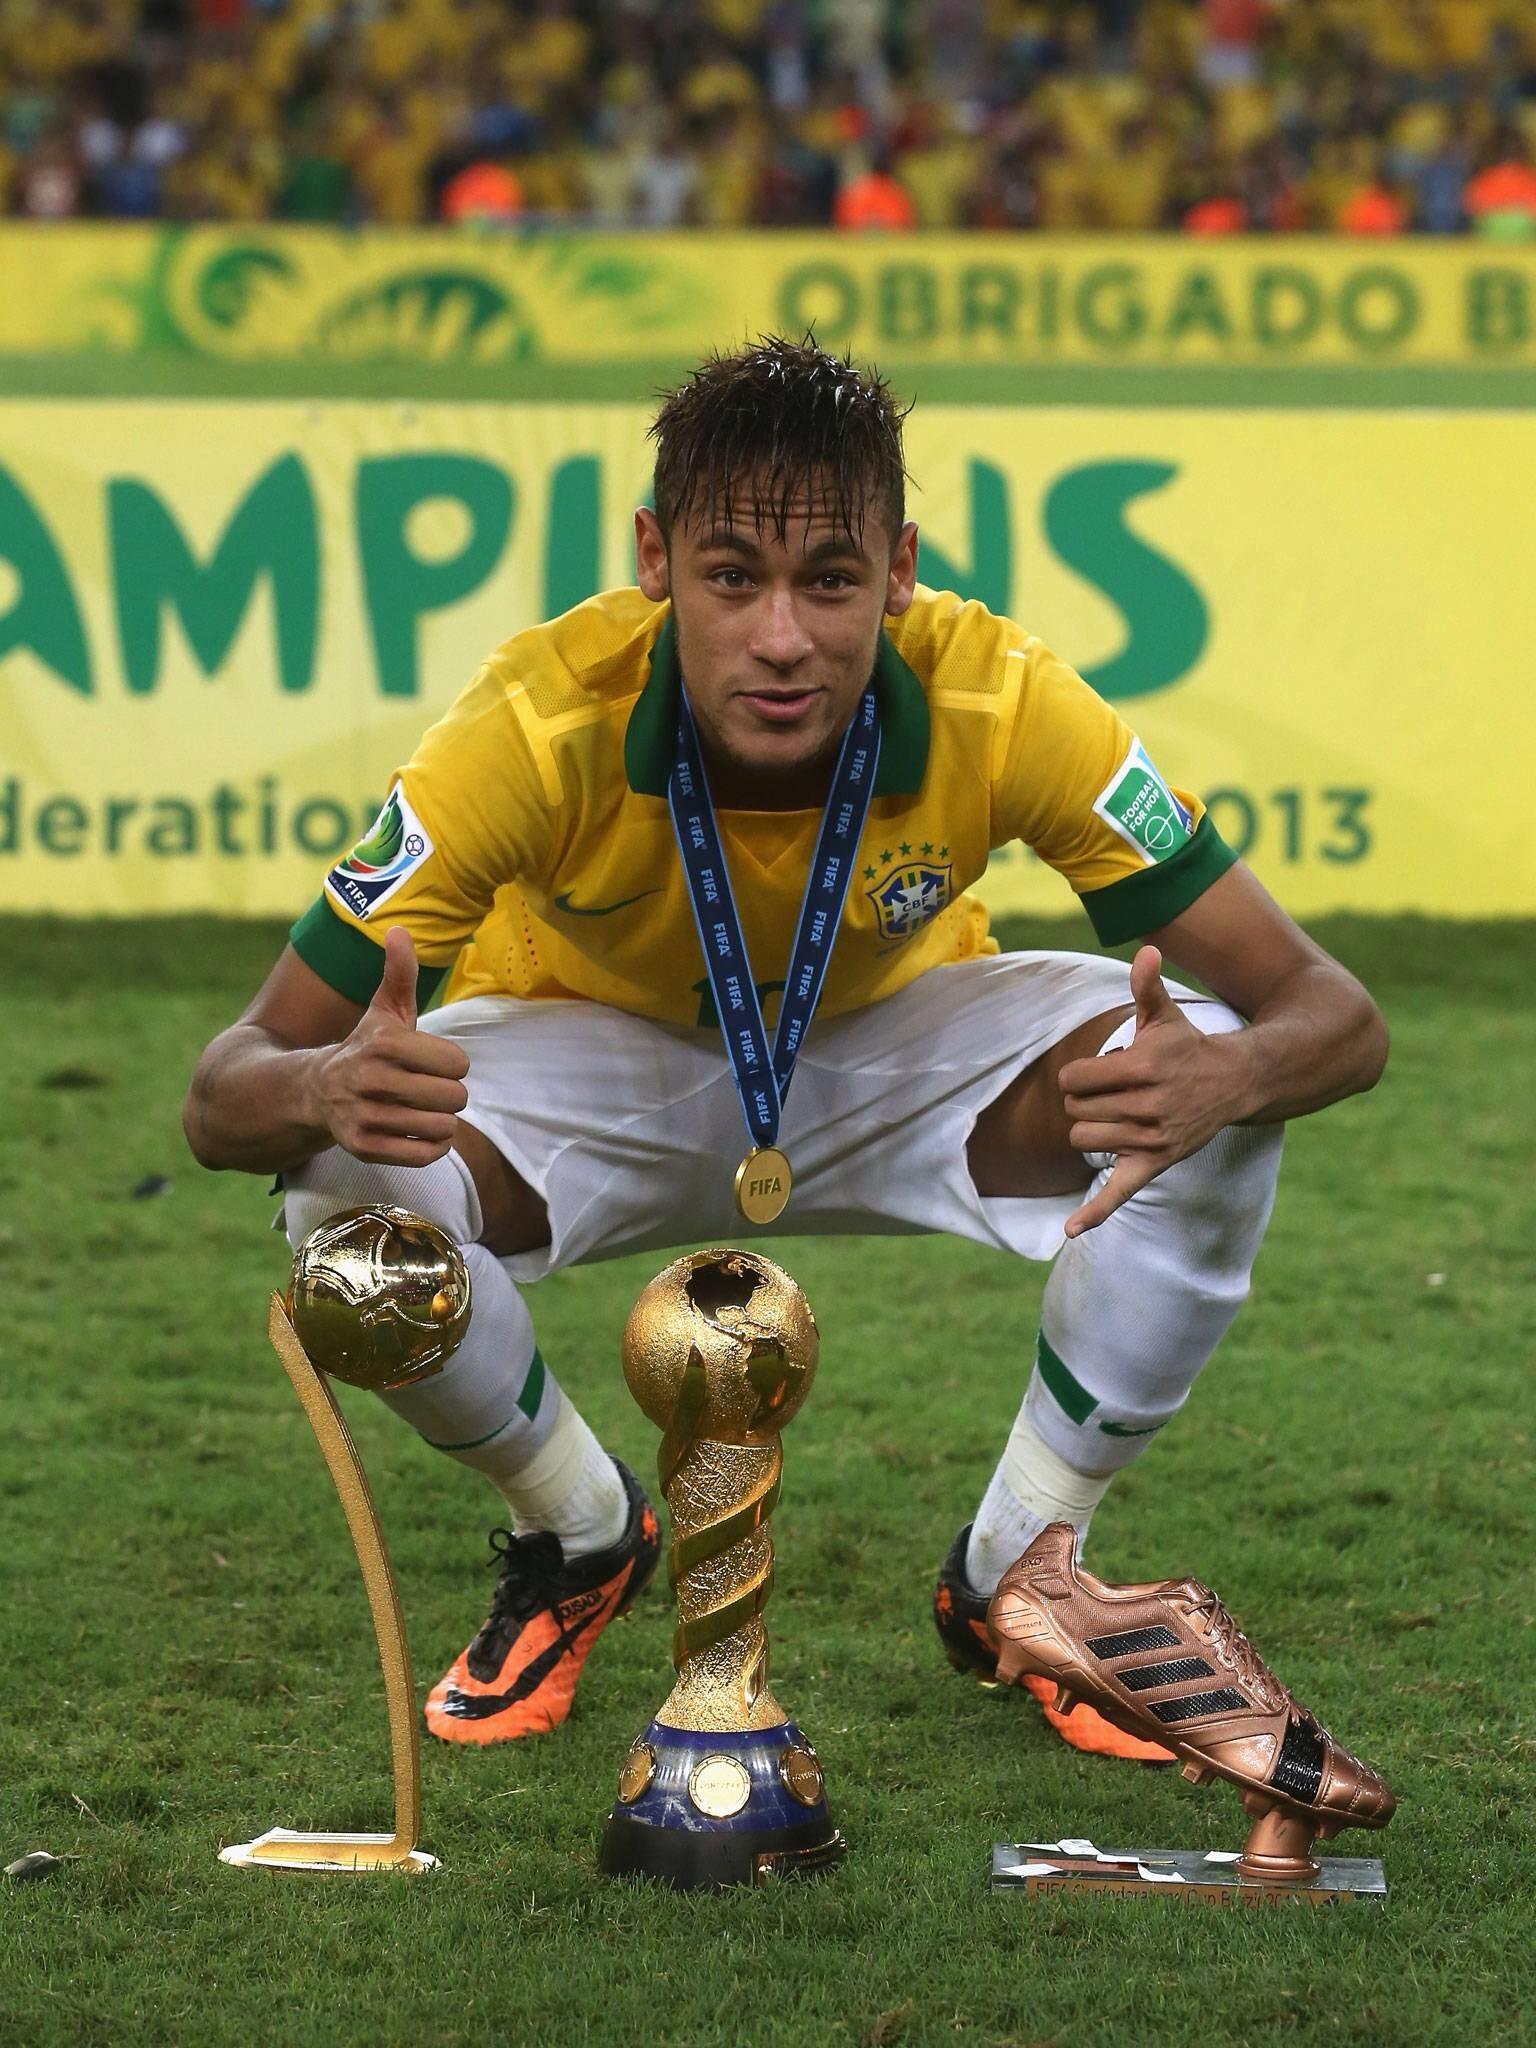 https://phototony.com/neymar-wallpaper/neymar-wallpaper-